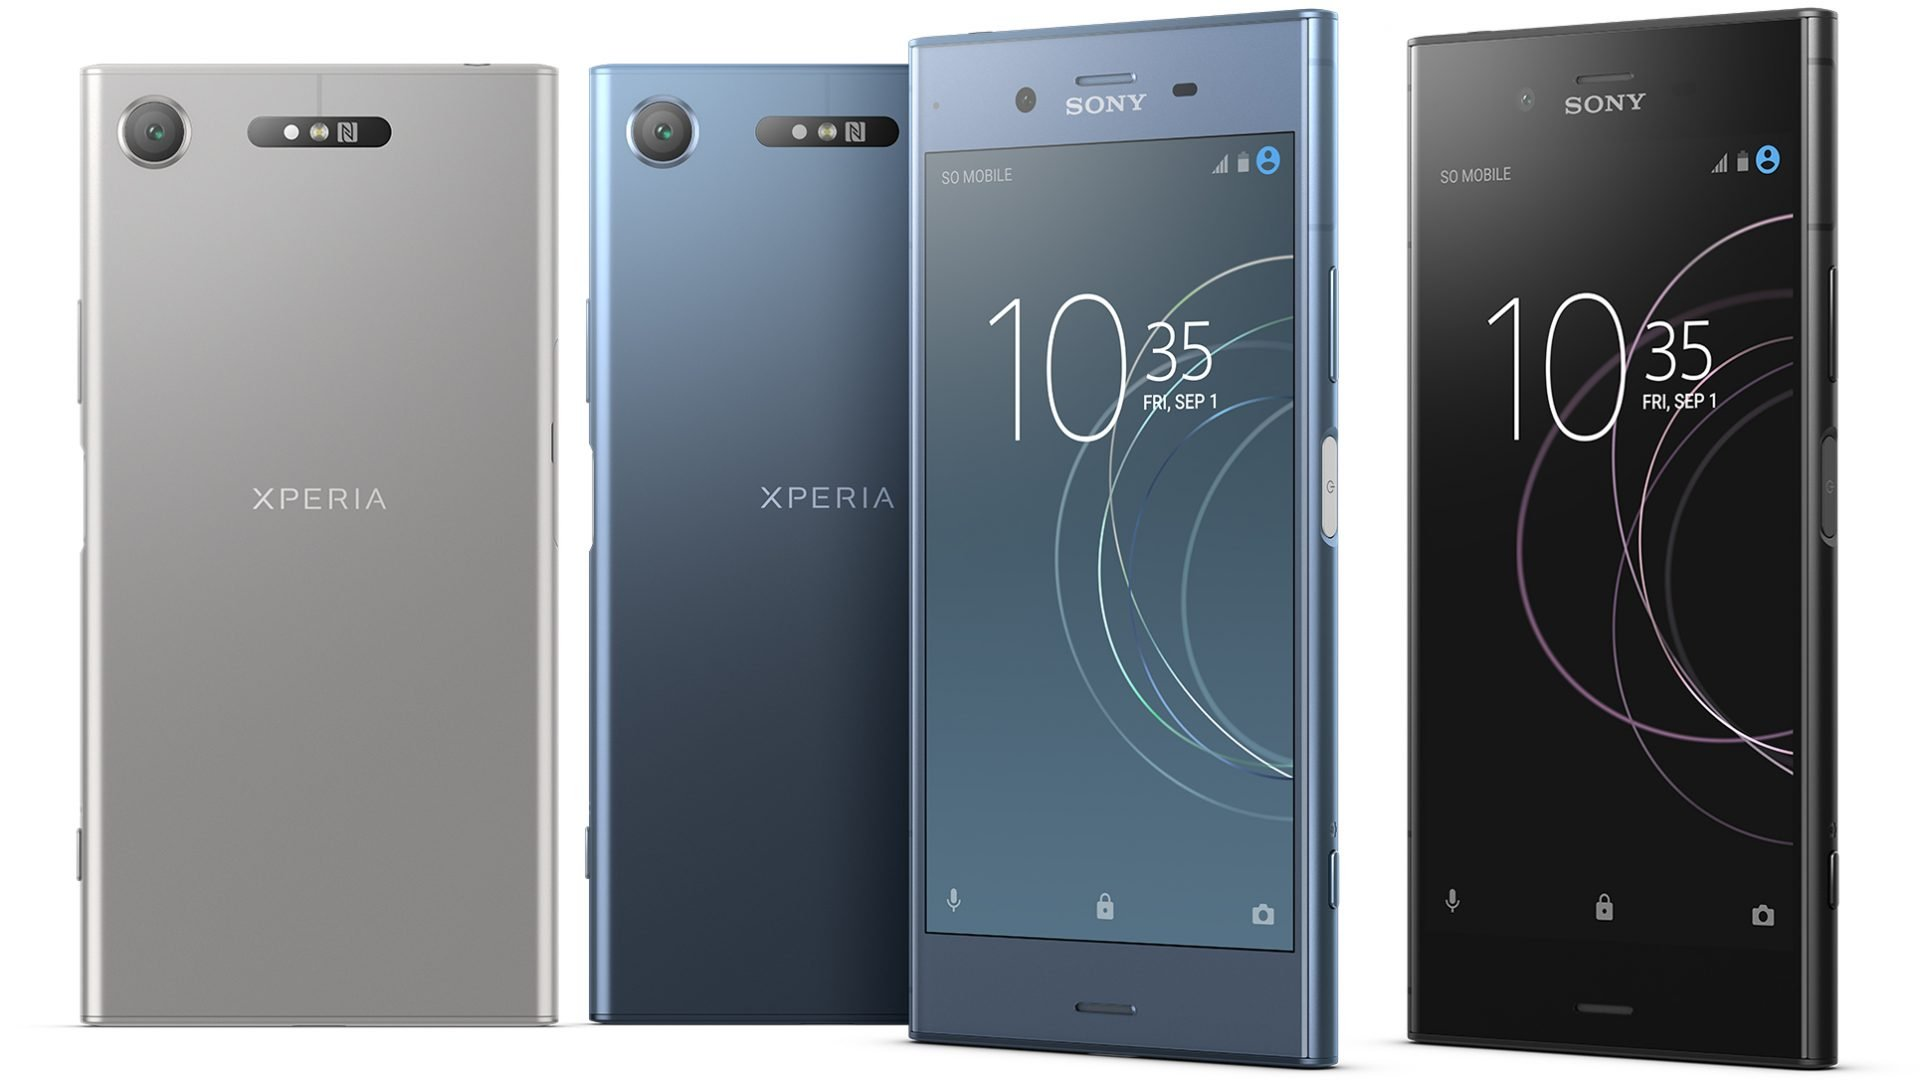 Sony Xperia XZ1 mavi siyah beyaz